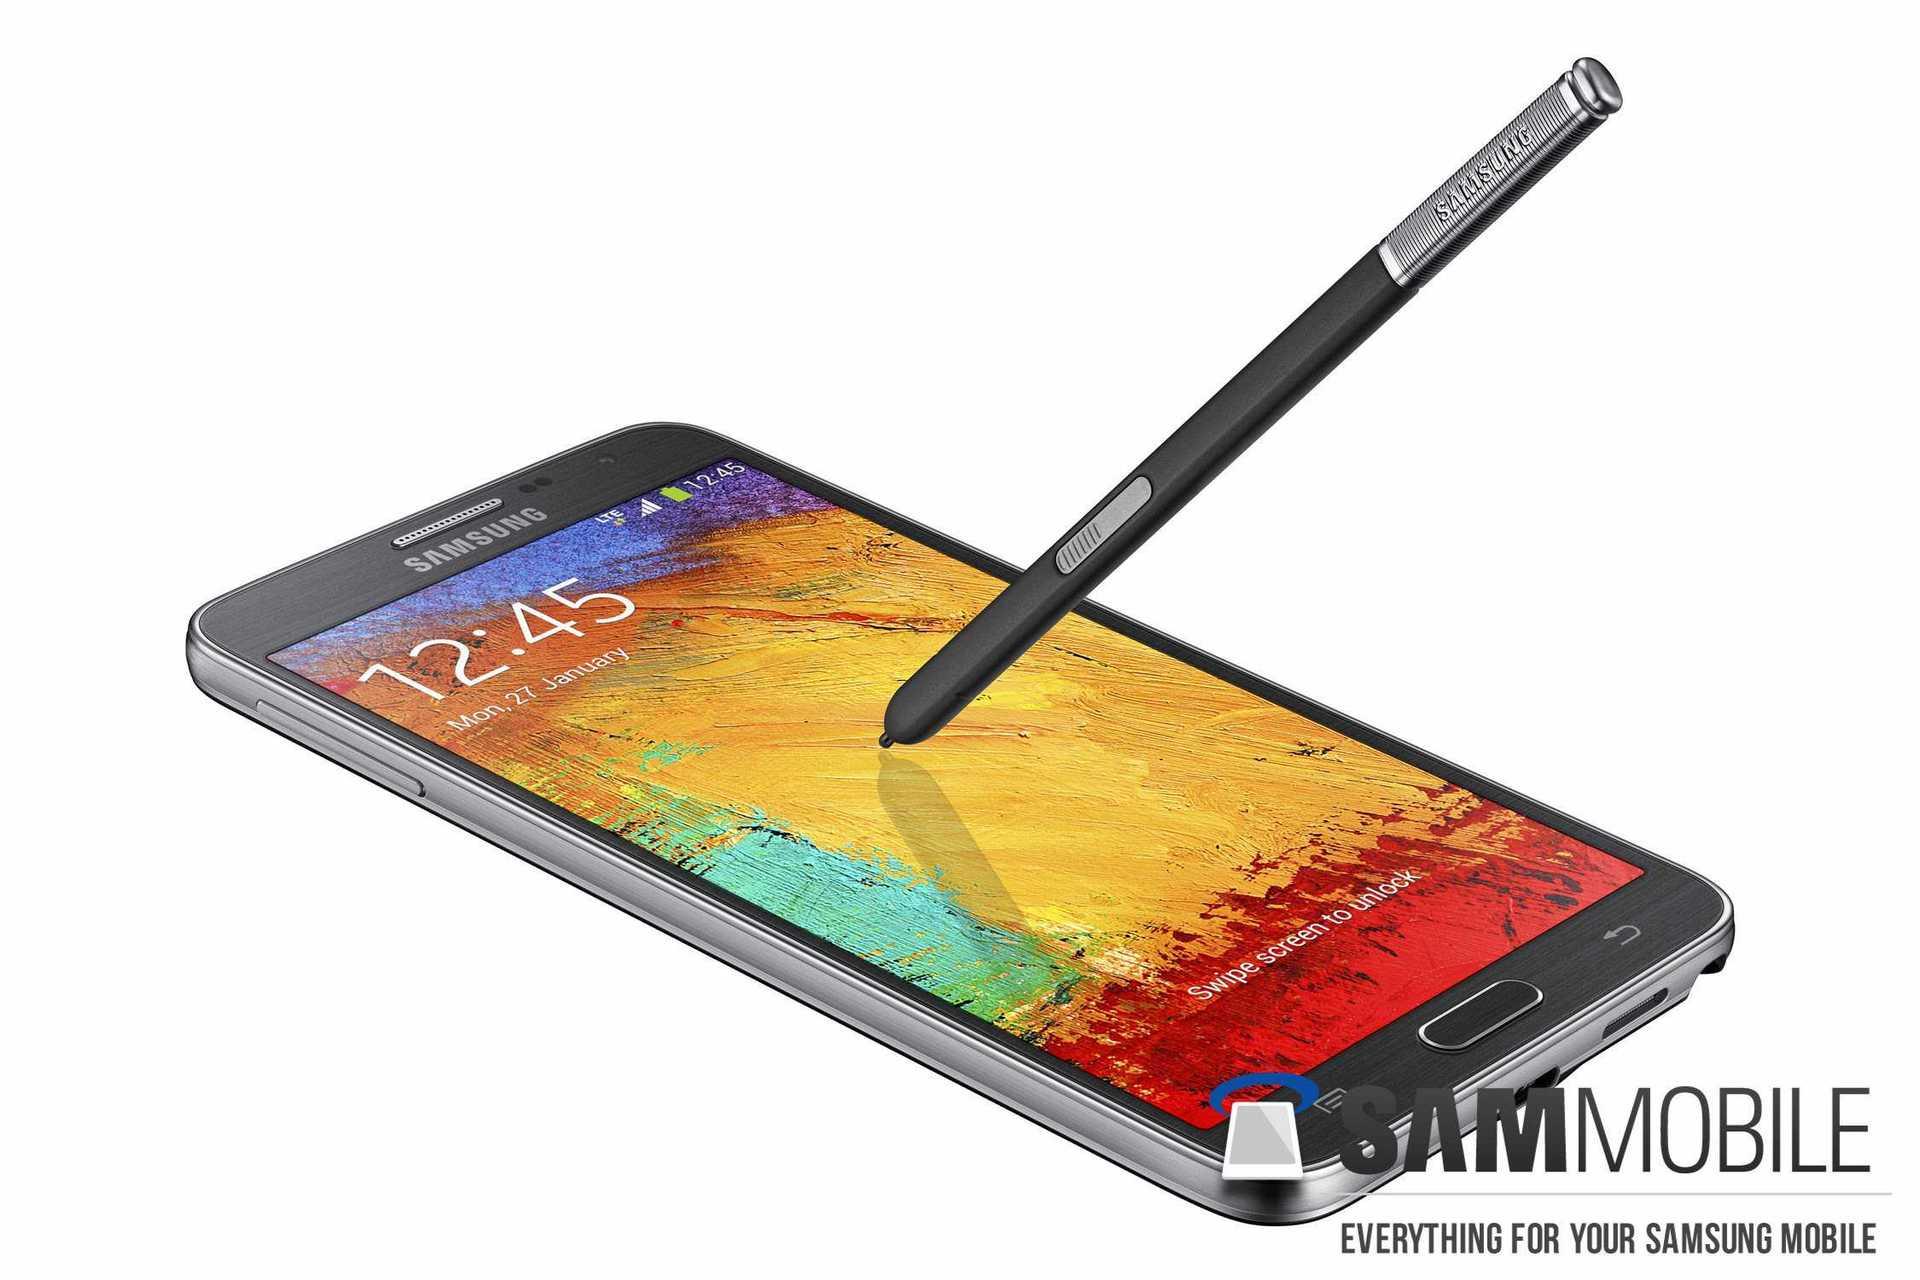 Galaxy Note 3 Video 4k: impressionante